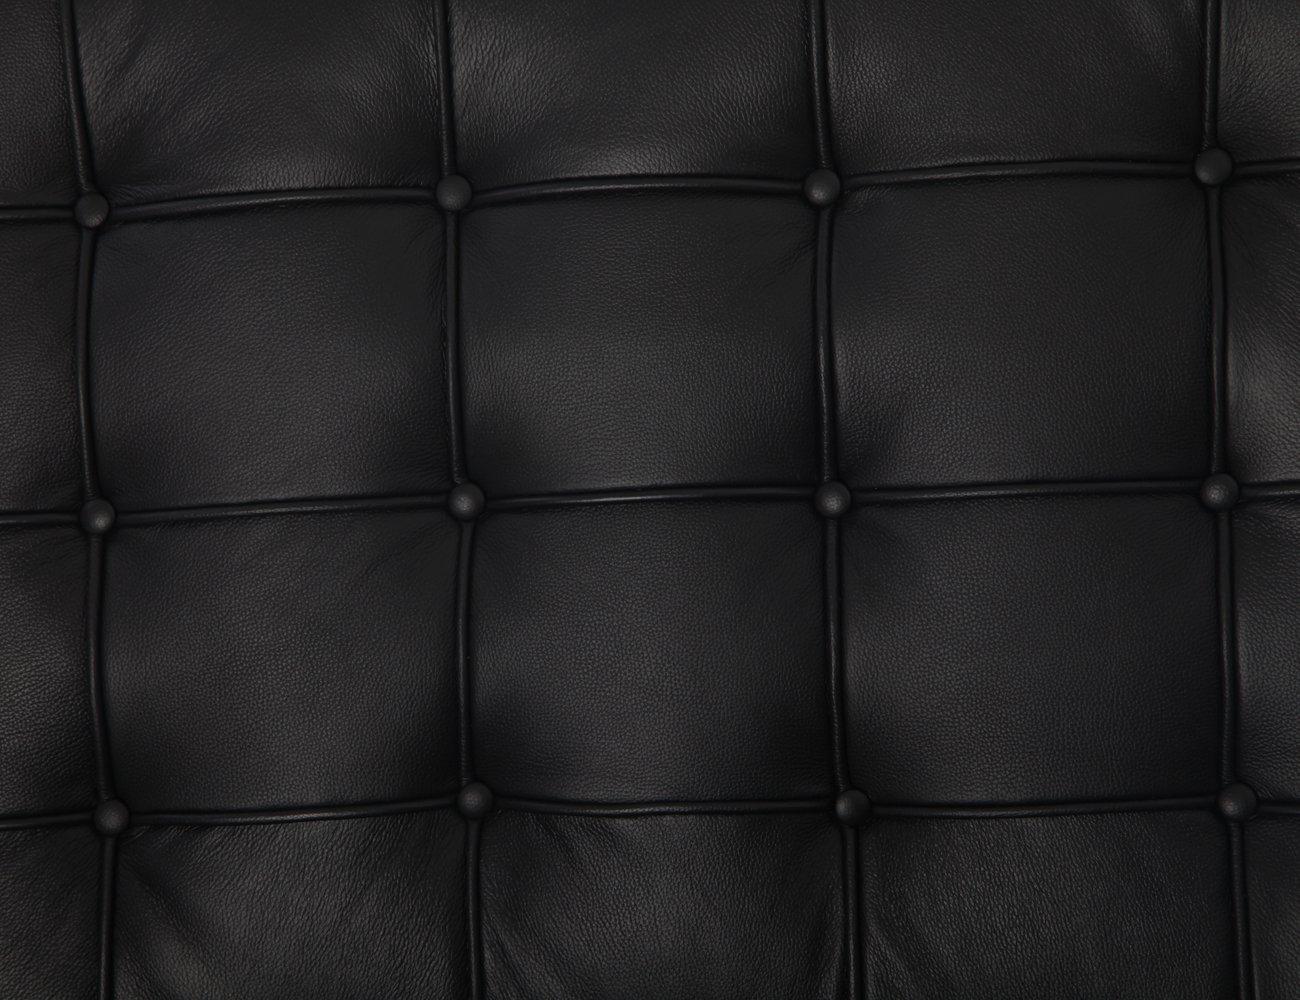 Black leather chair texture - Black Leather Texture Seamless Home Improvement Amazon Com Mcm Barcelona Style Modern Pavilion Chair Black